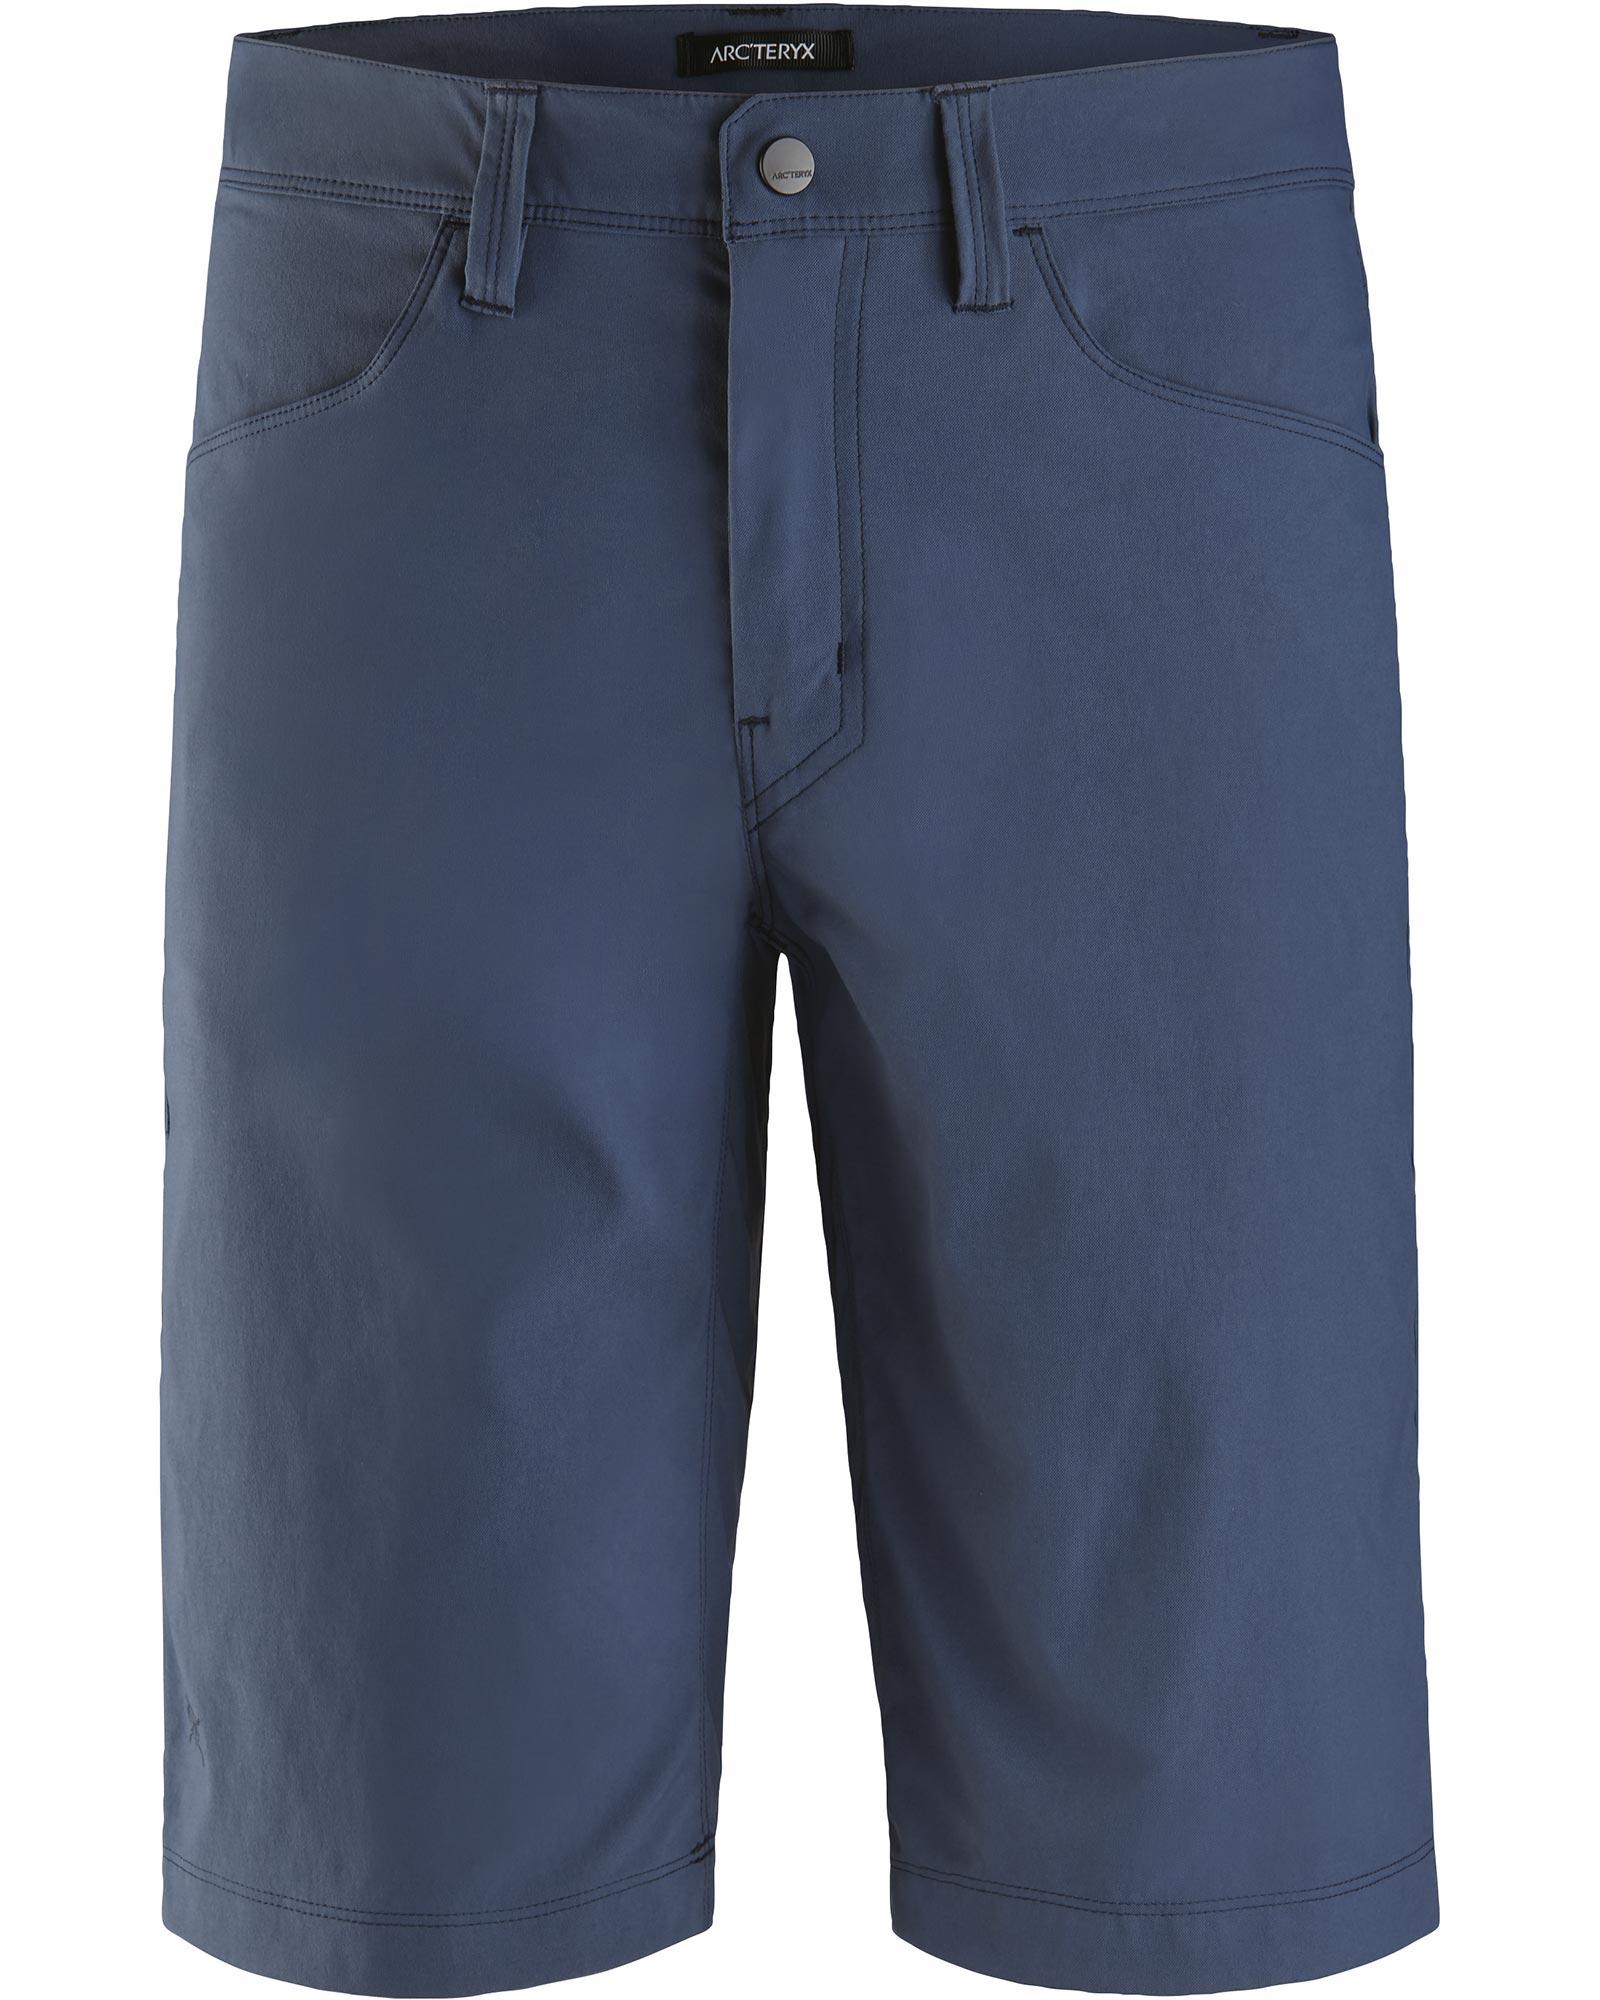 Arc'teryx Men's Russet Shorts 0